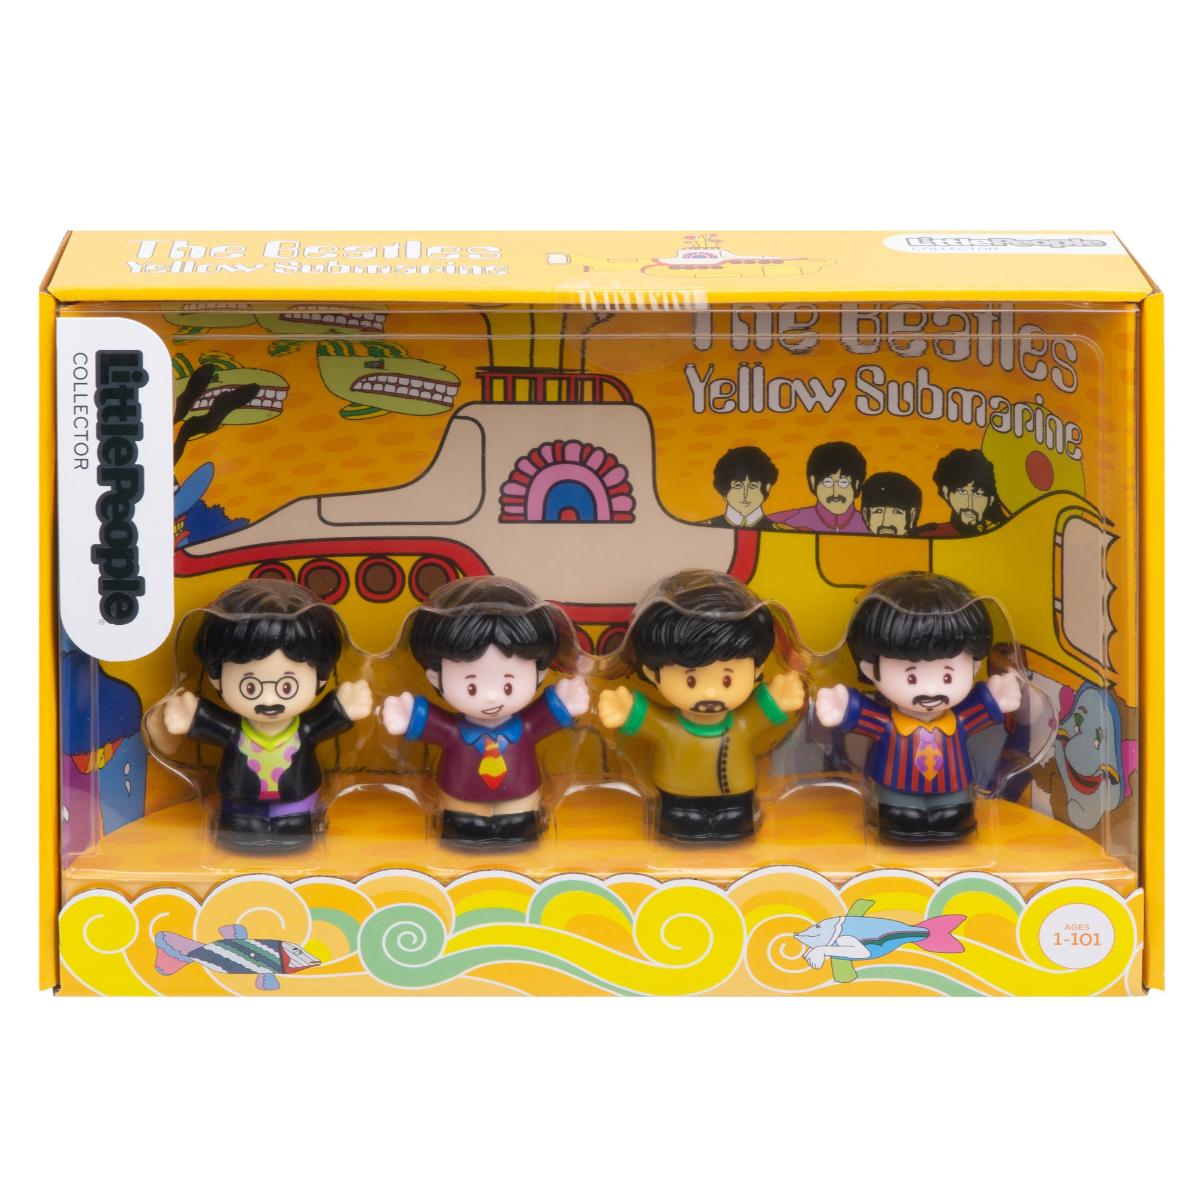 Little People Yellow Submarine Set